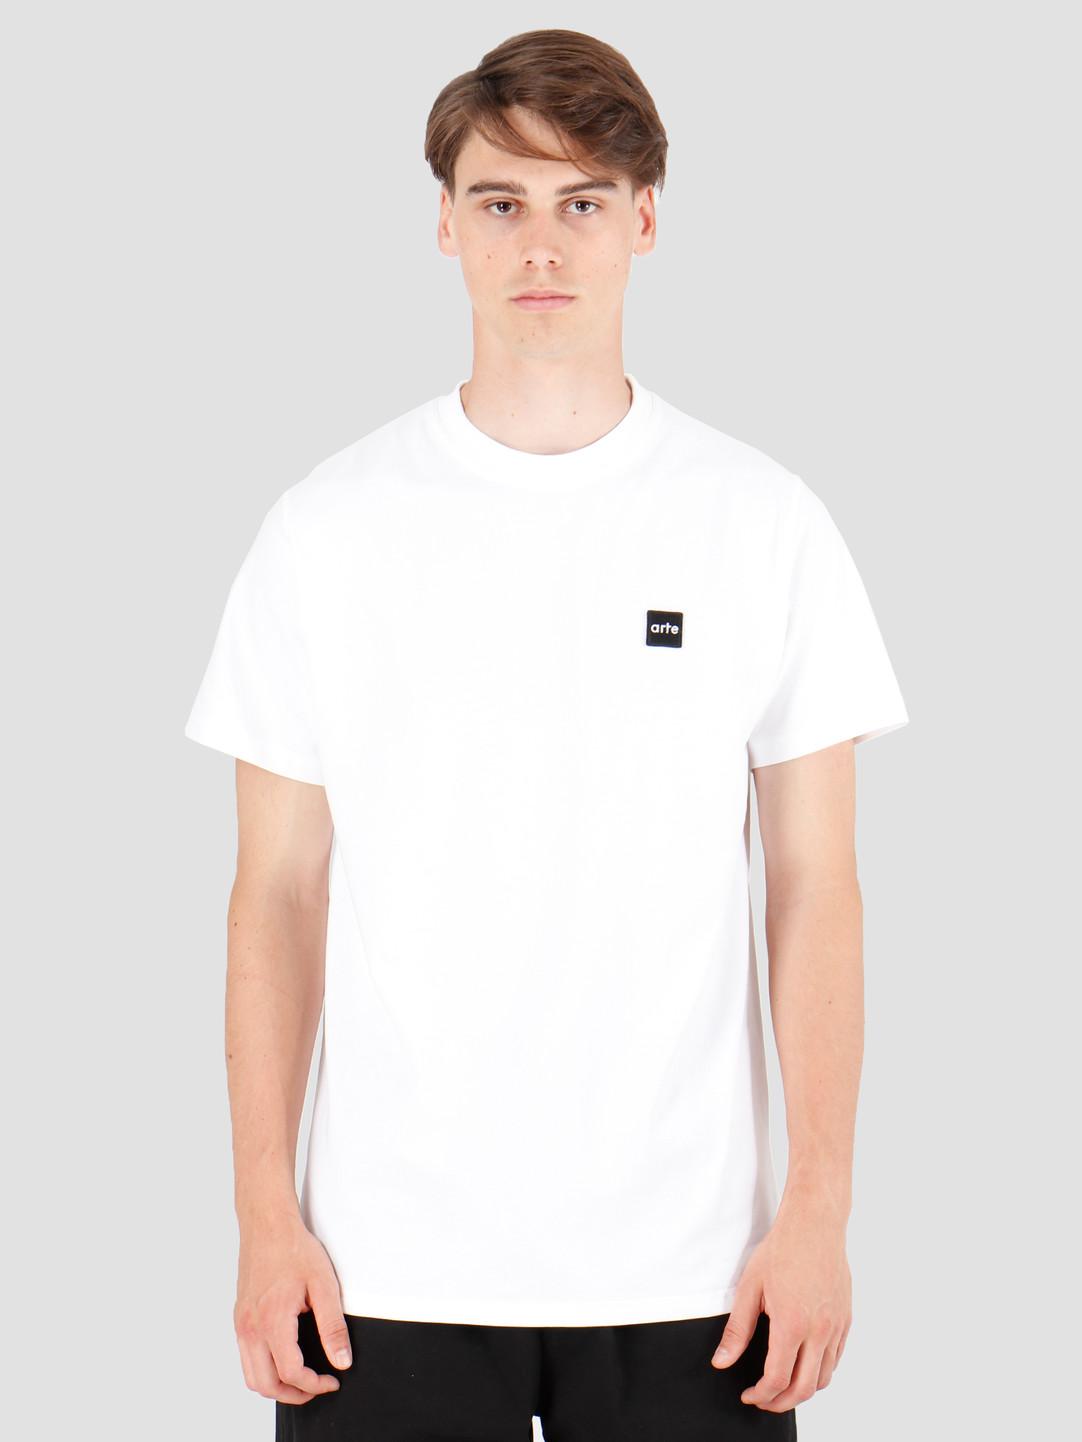 Arte Antwerp Arte Antwerp Tyler Patch T-Shirt White AW19-073